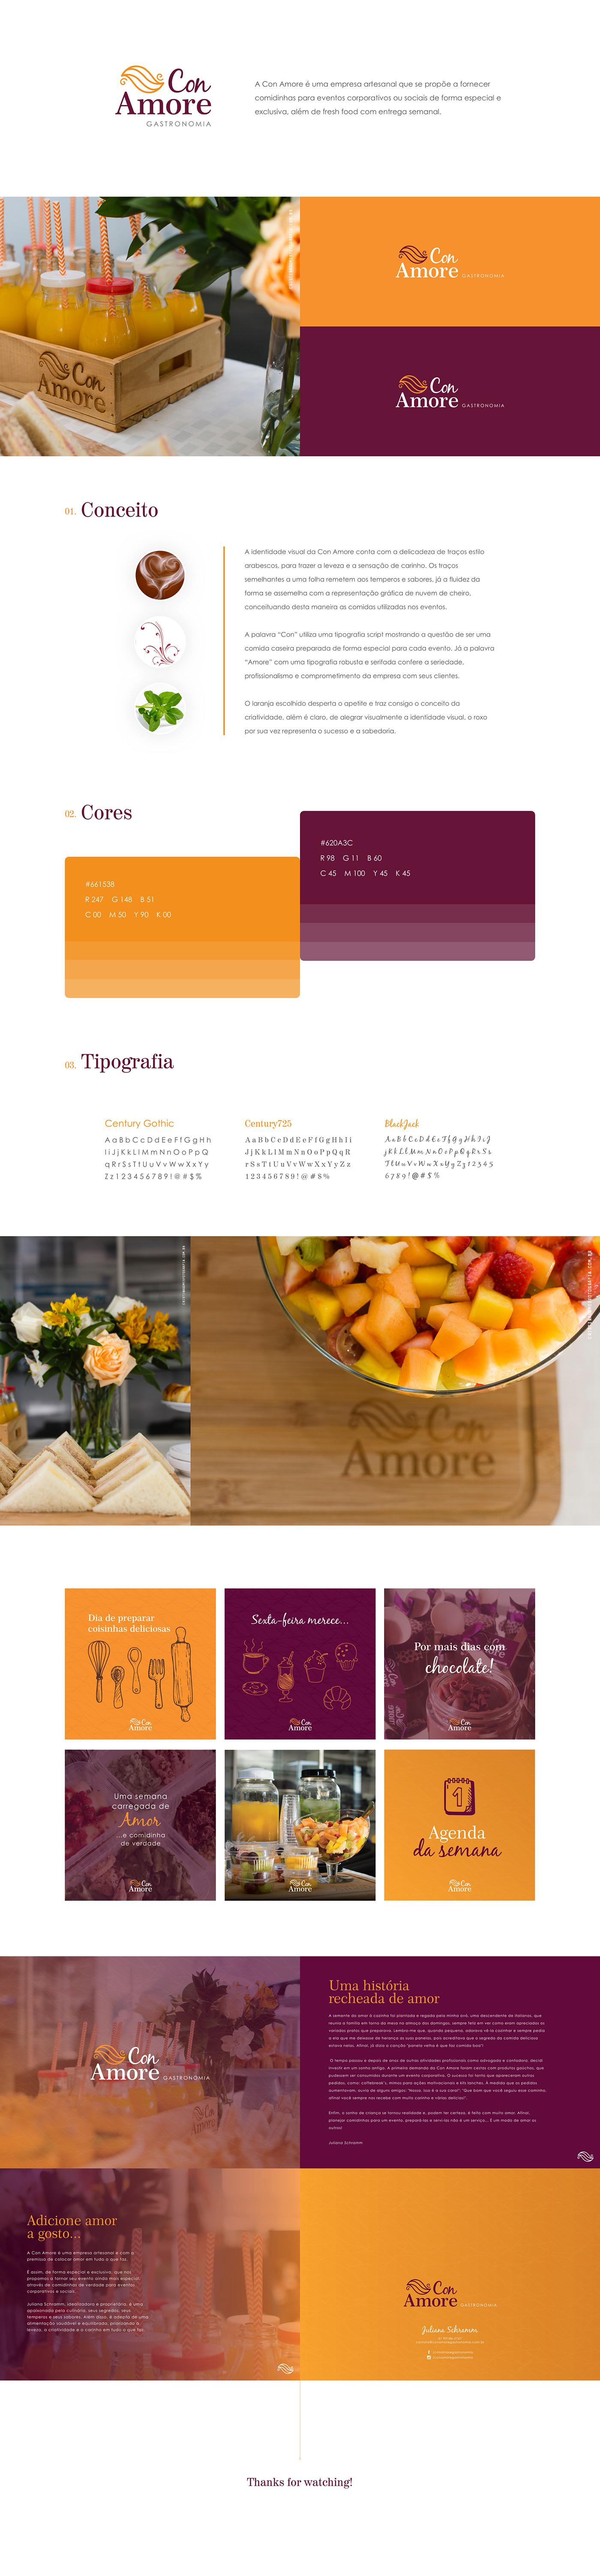 eventos gastronomia snacks amor Coffee Love Food  delicius brand logo orange purple